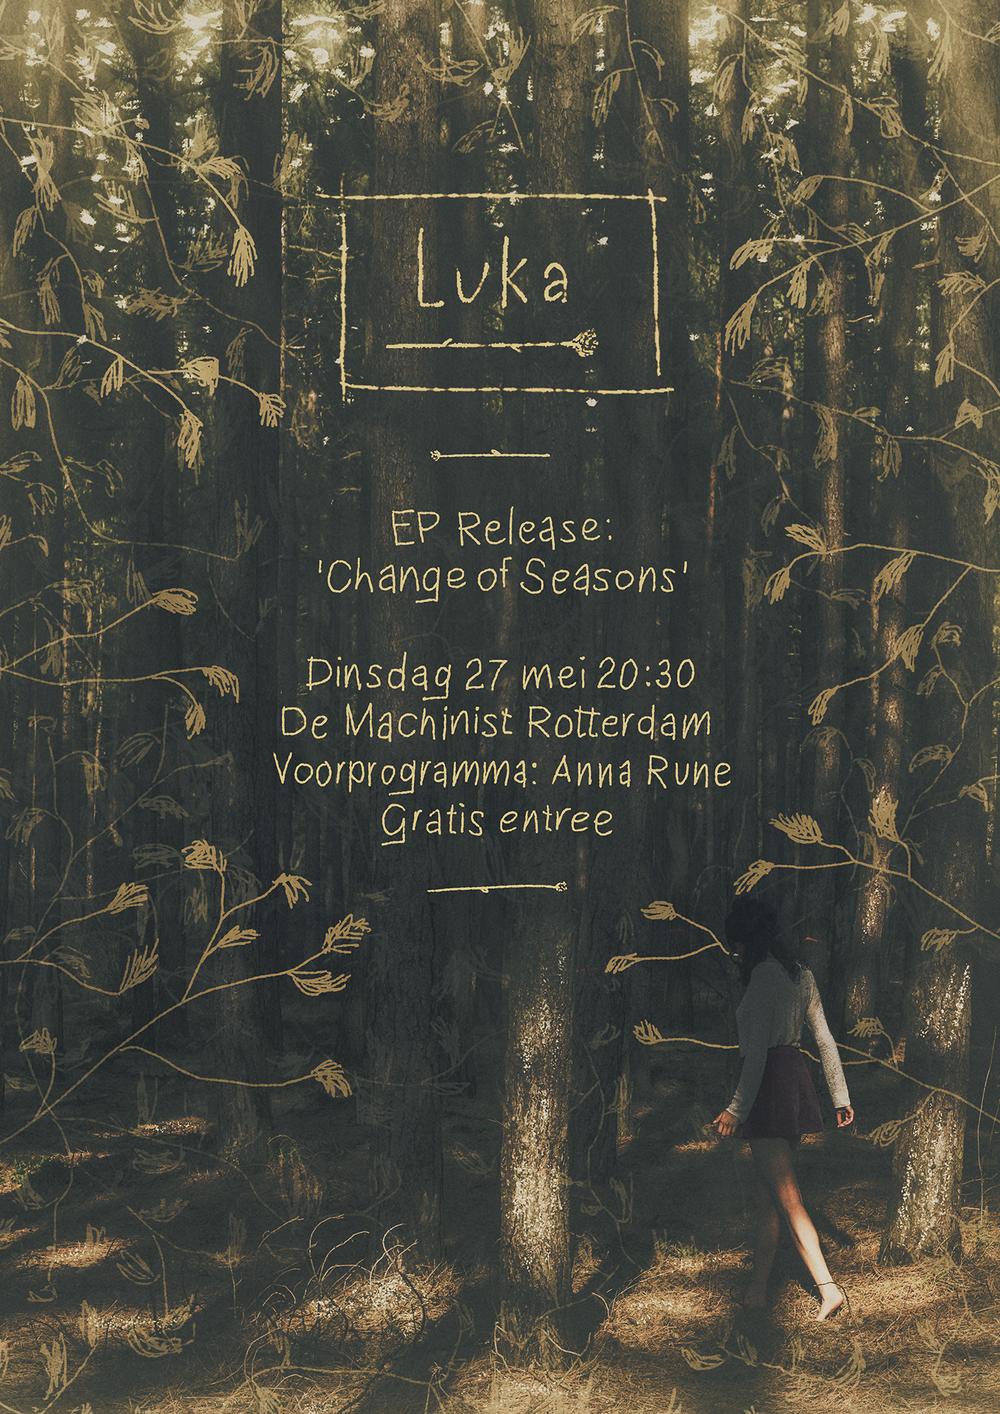 Luka-poster.png